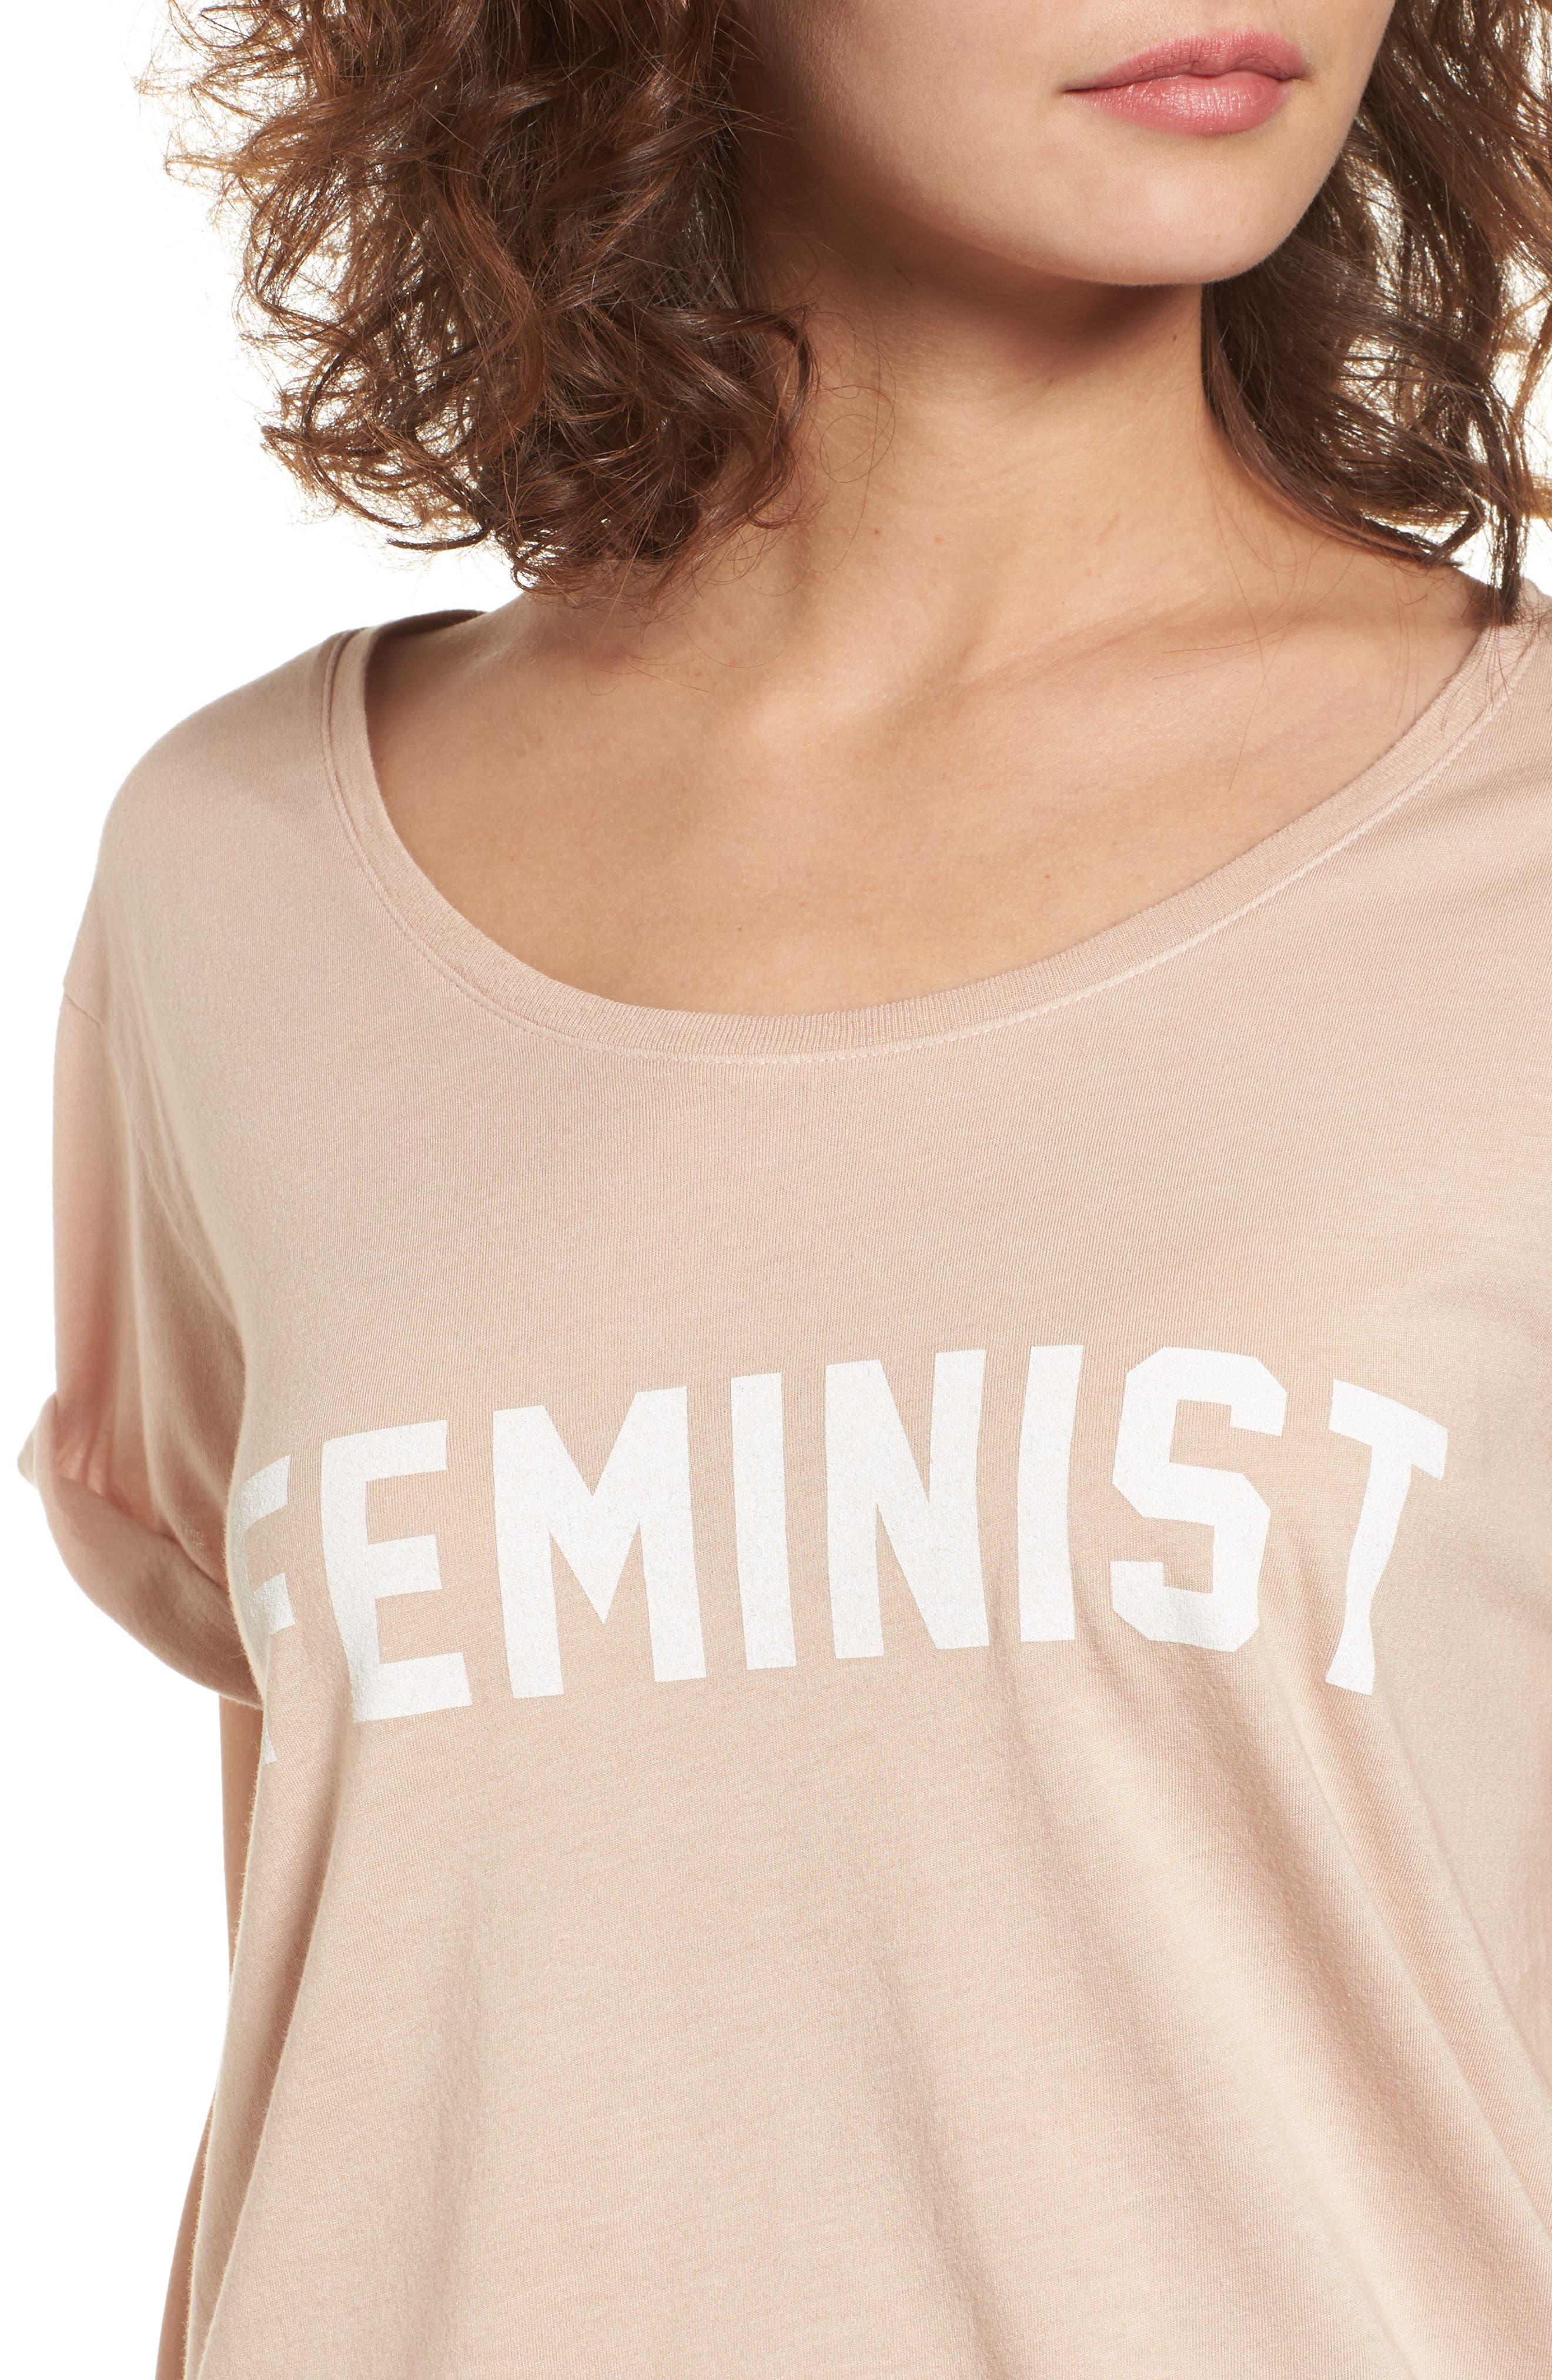 Feminist Graphic Tee,                             Alternate thumbnail 4, color,                             250